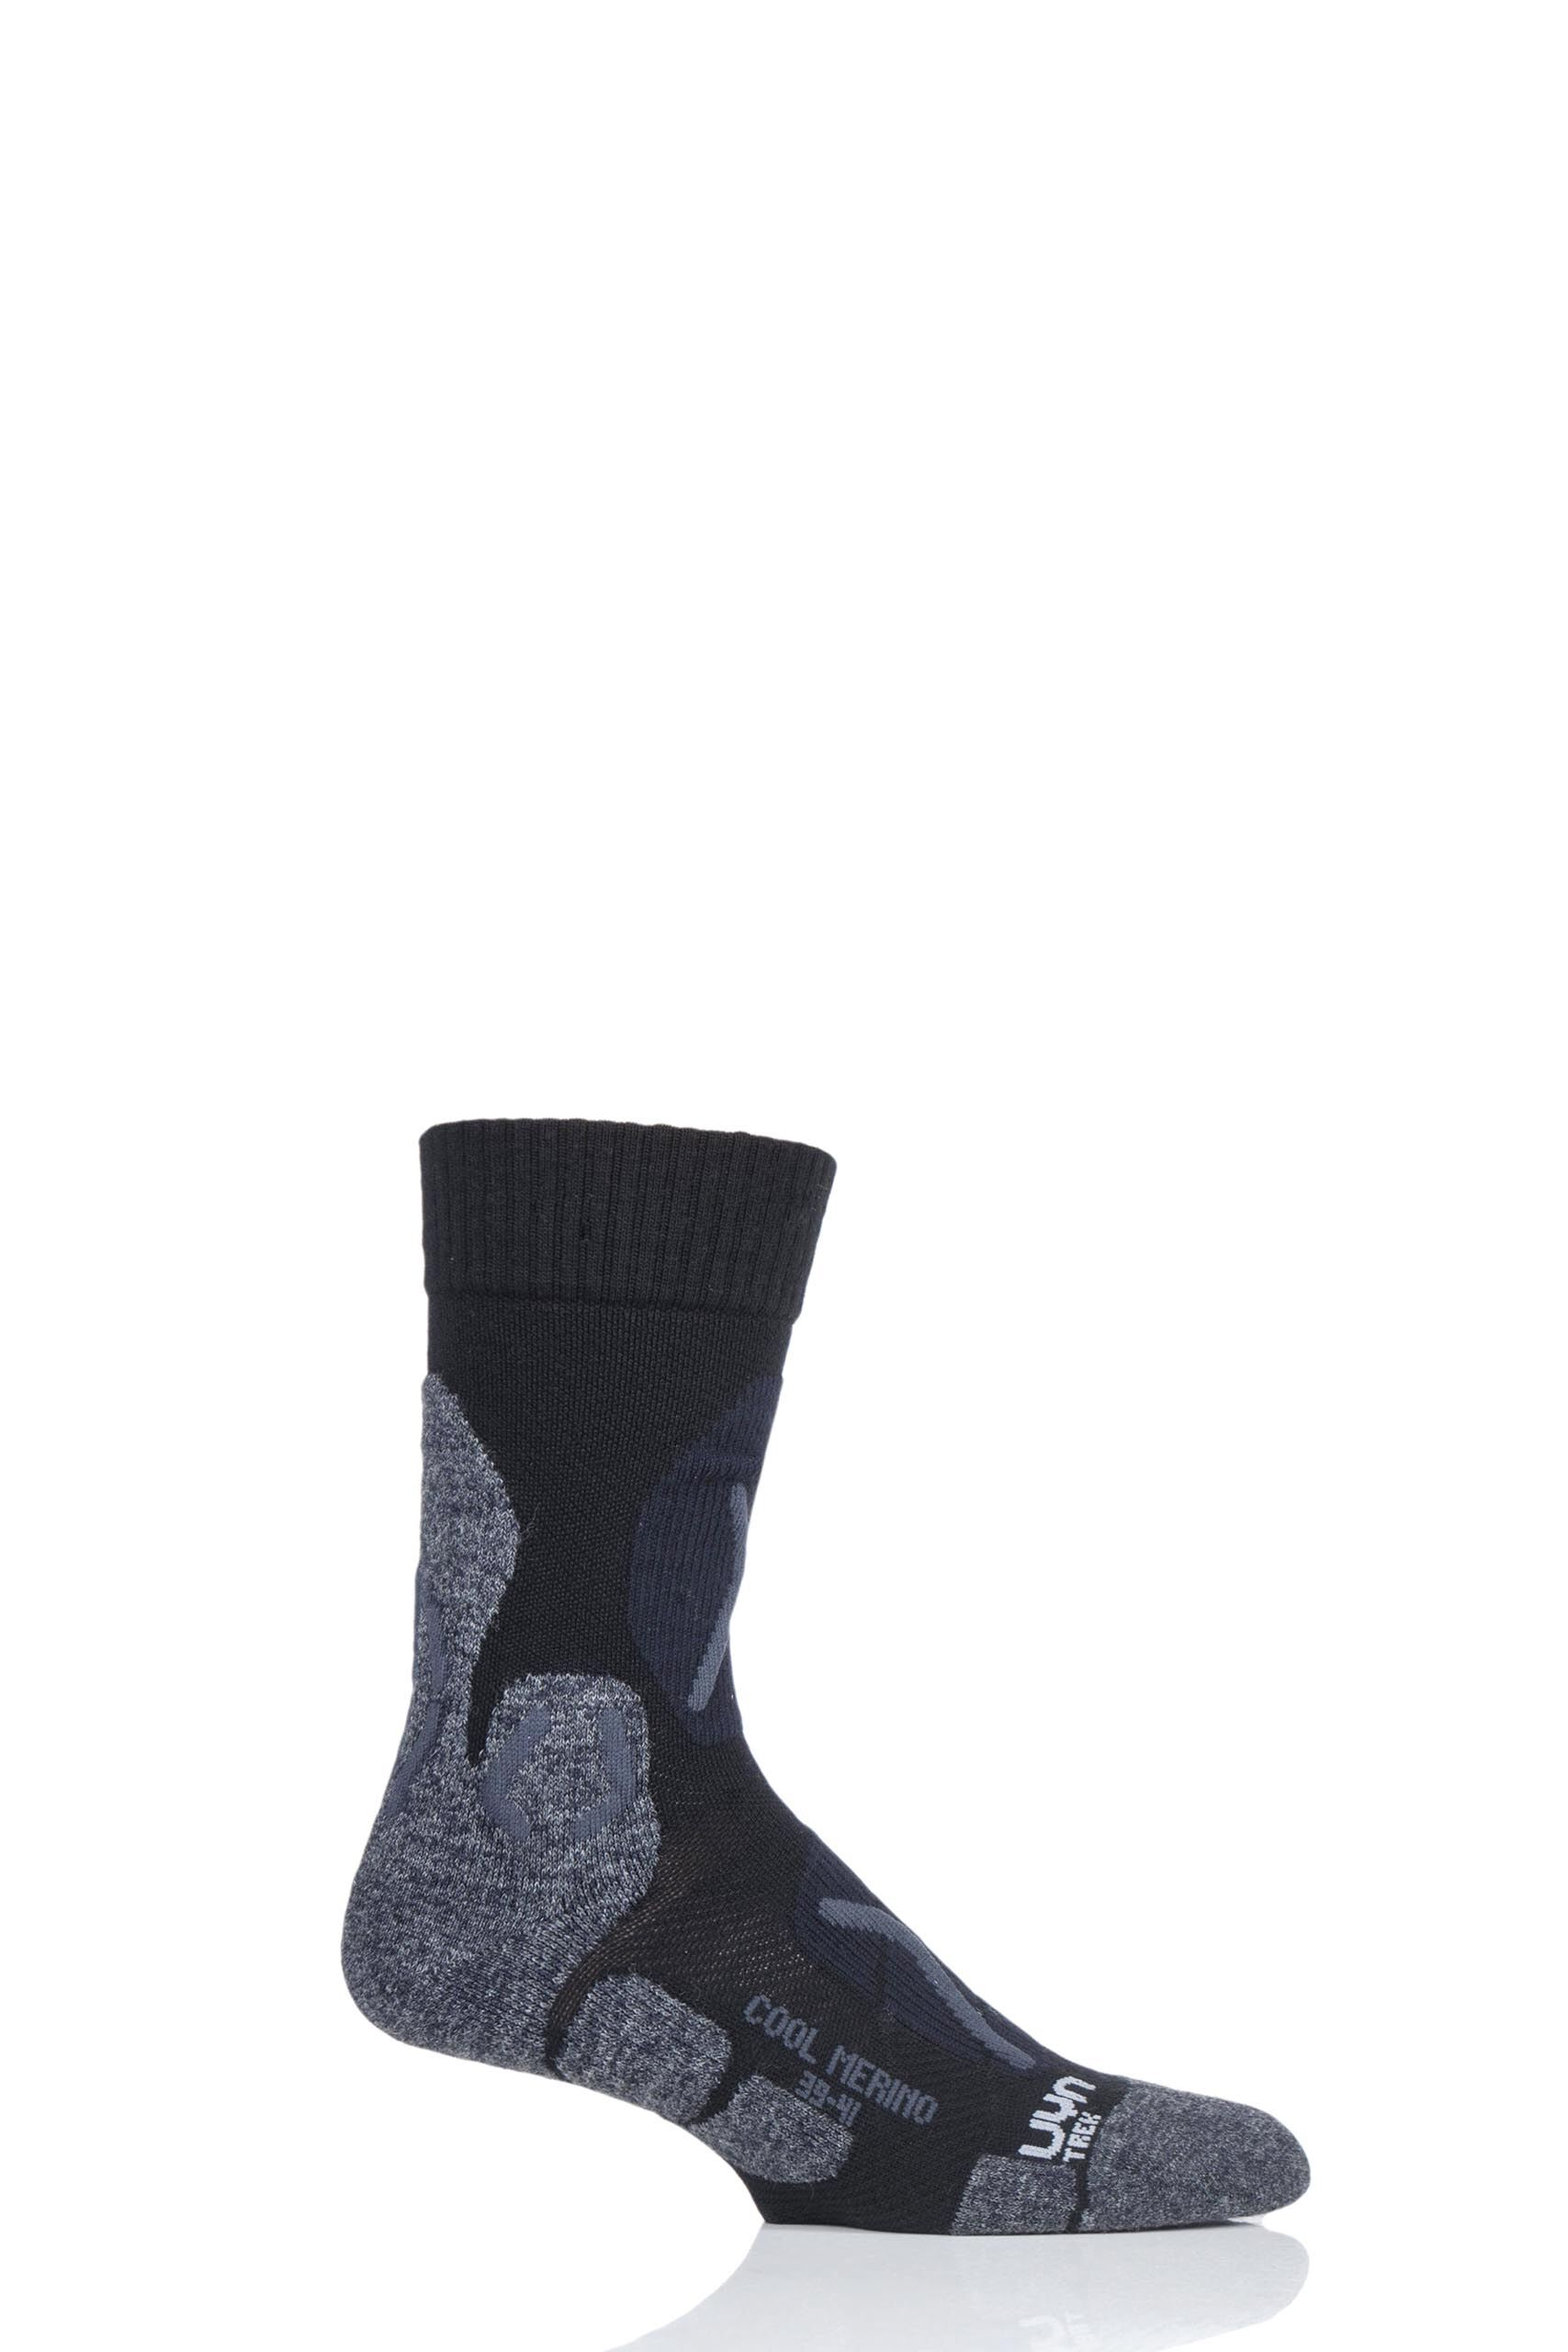 Image of 1 Pair Black Cool Merino Trekking Socks Men's 3-5.5 Mens - UYN